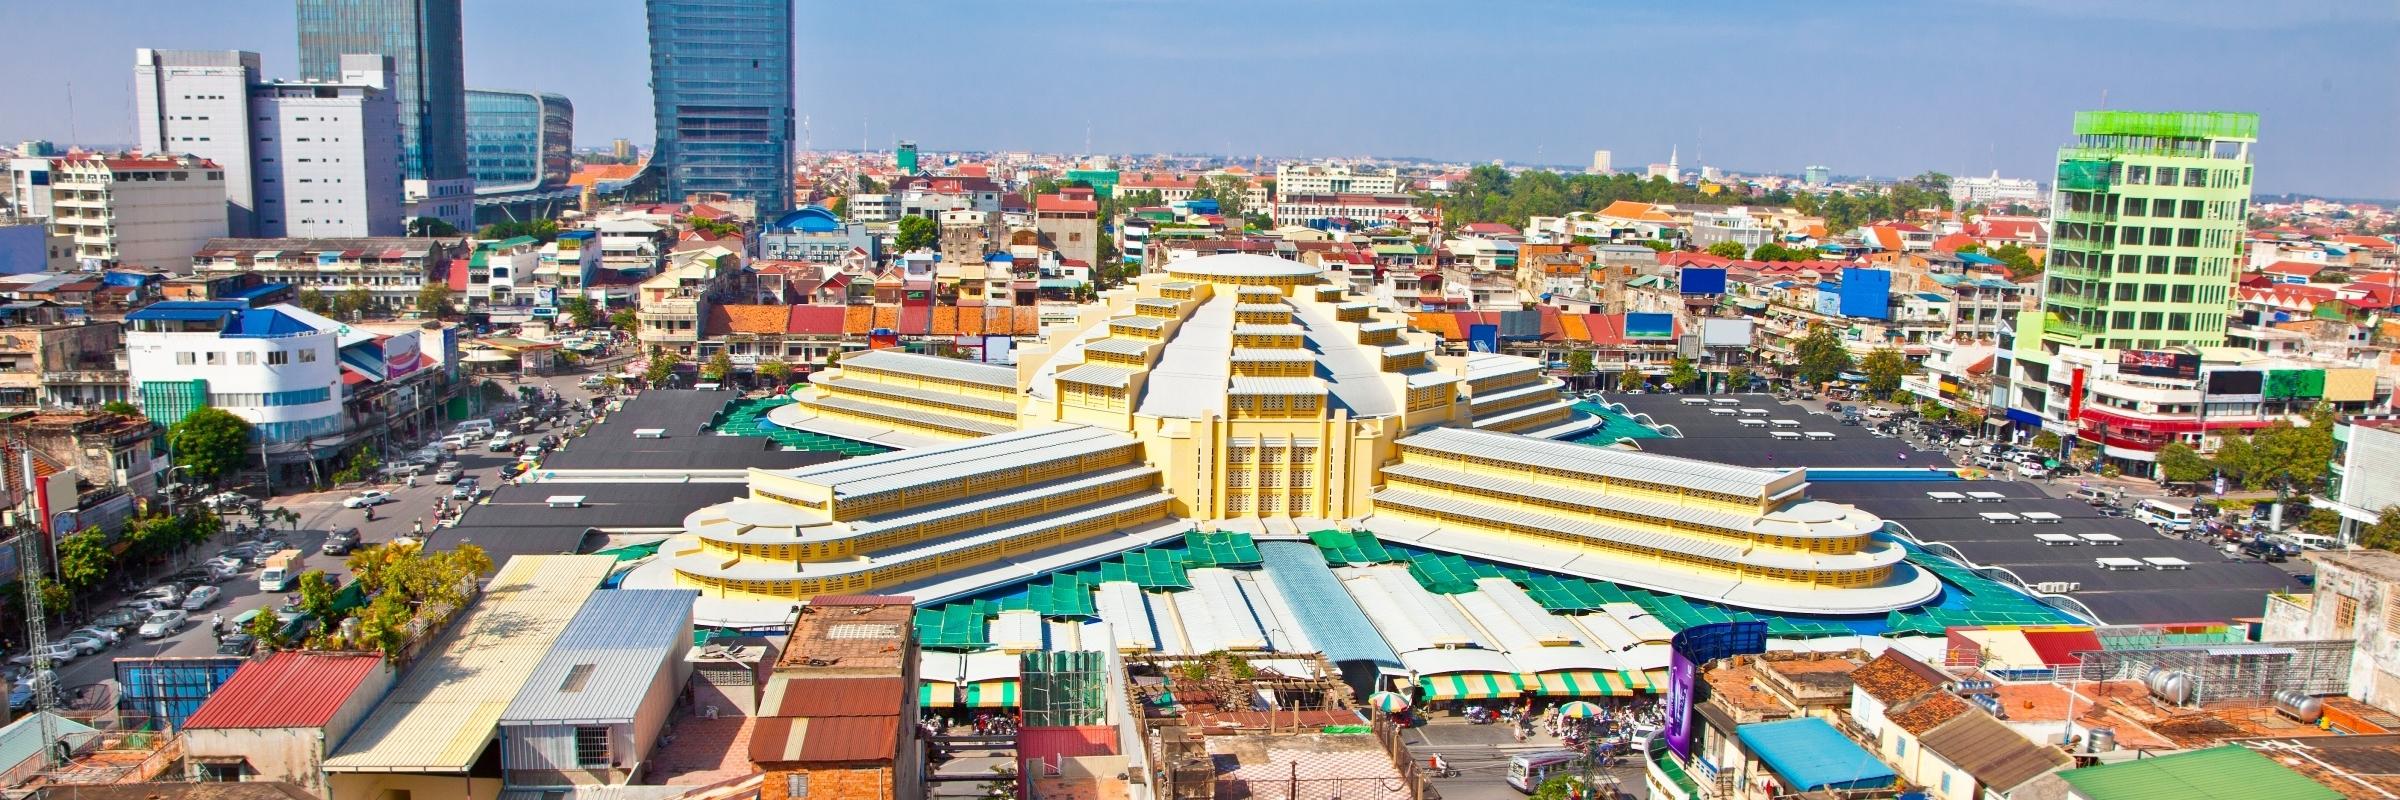 https://gody.vn/blog/minhdiem9798/post/cam-nang-du-lich-phnom-penh-cambodia-tu-tuc-chi-phi-tiet-kiem-5676